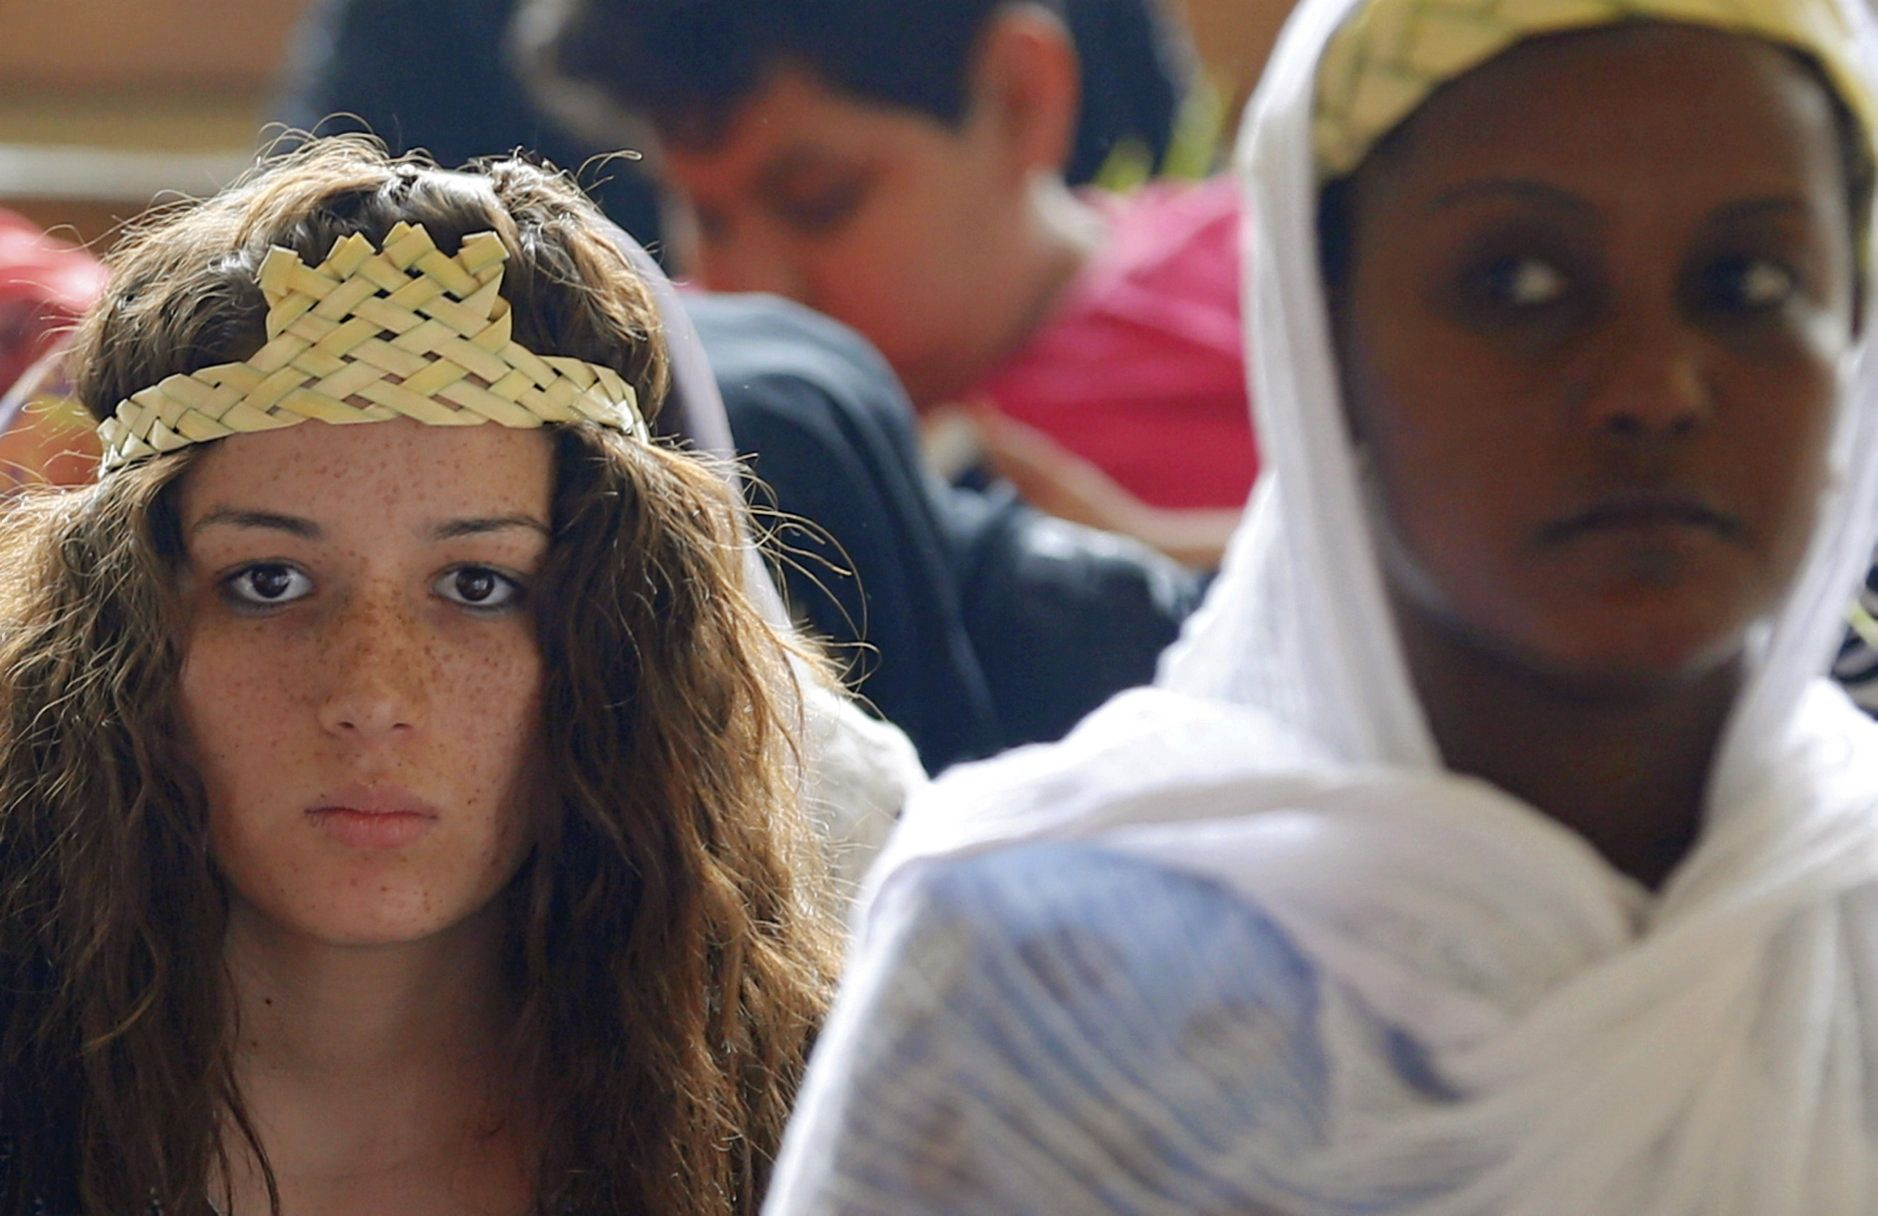 Muslim women seeking white christian men